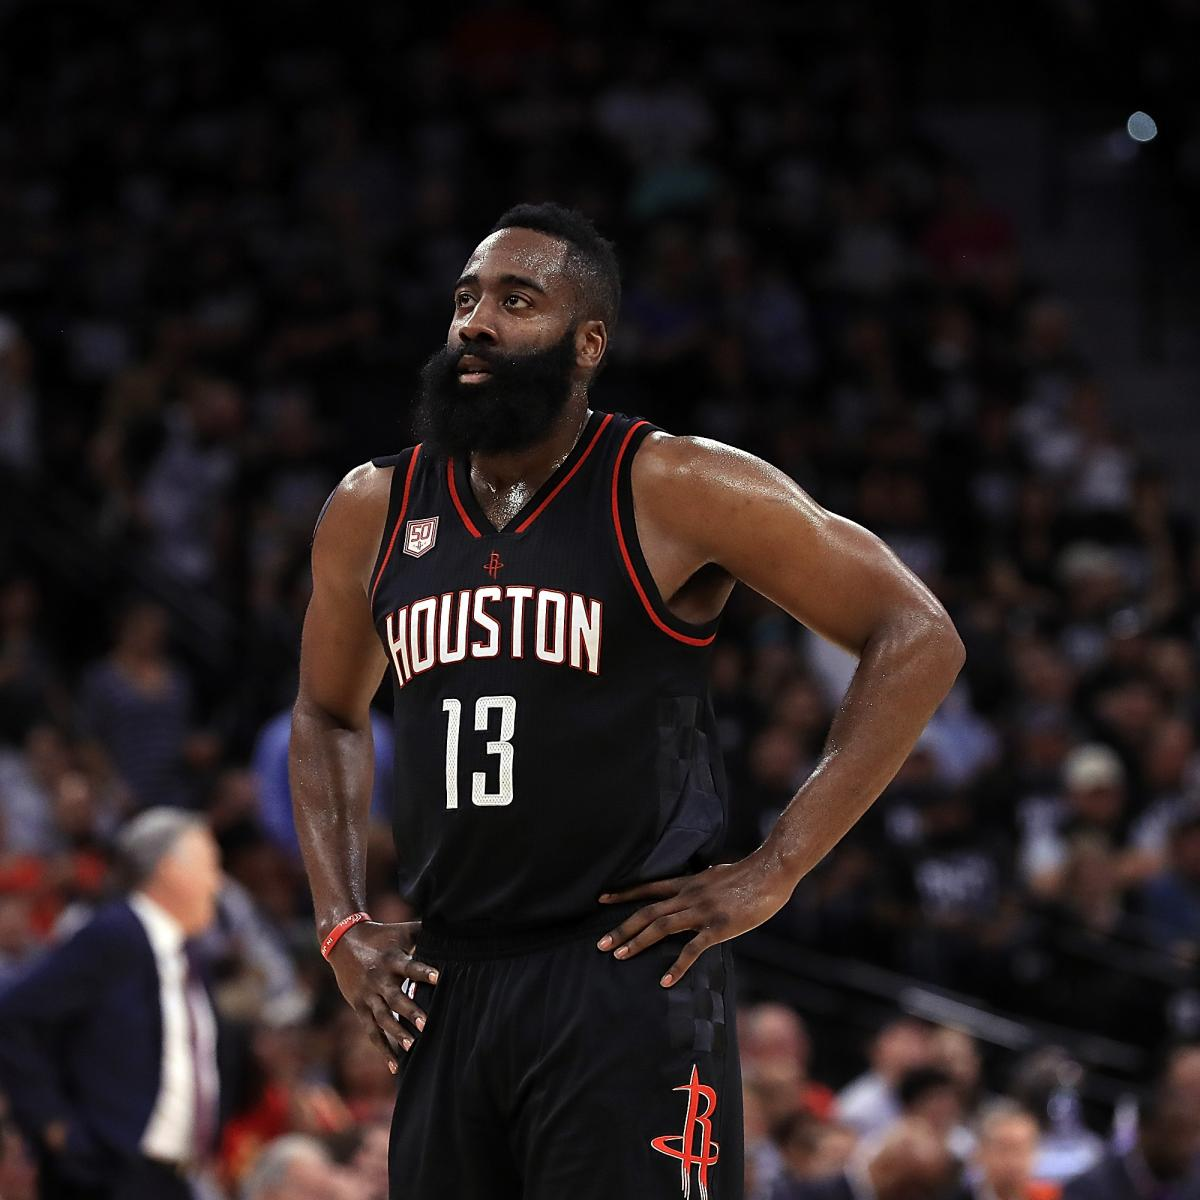 Houston Rockets Defensive Coach: Rockets Asst. Coach's Challenge To James Harden: Play D